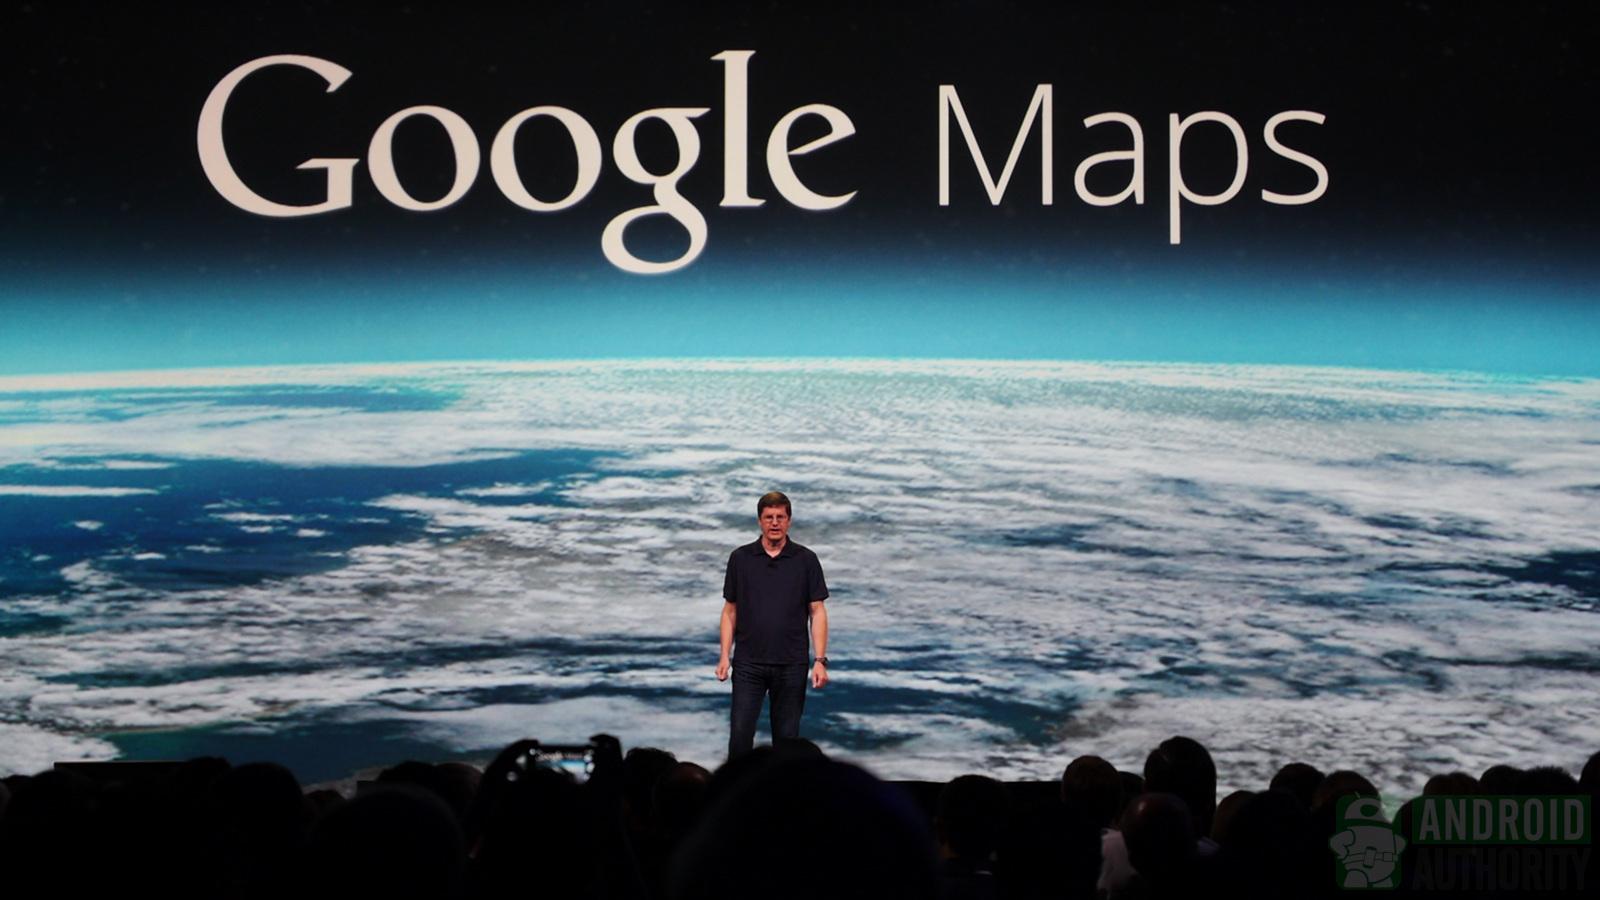 Google-IO-2013 Google Maps 99 1600 aa